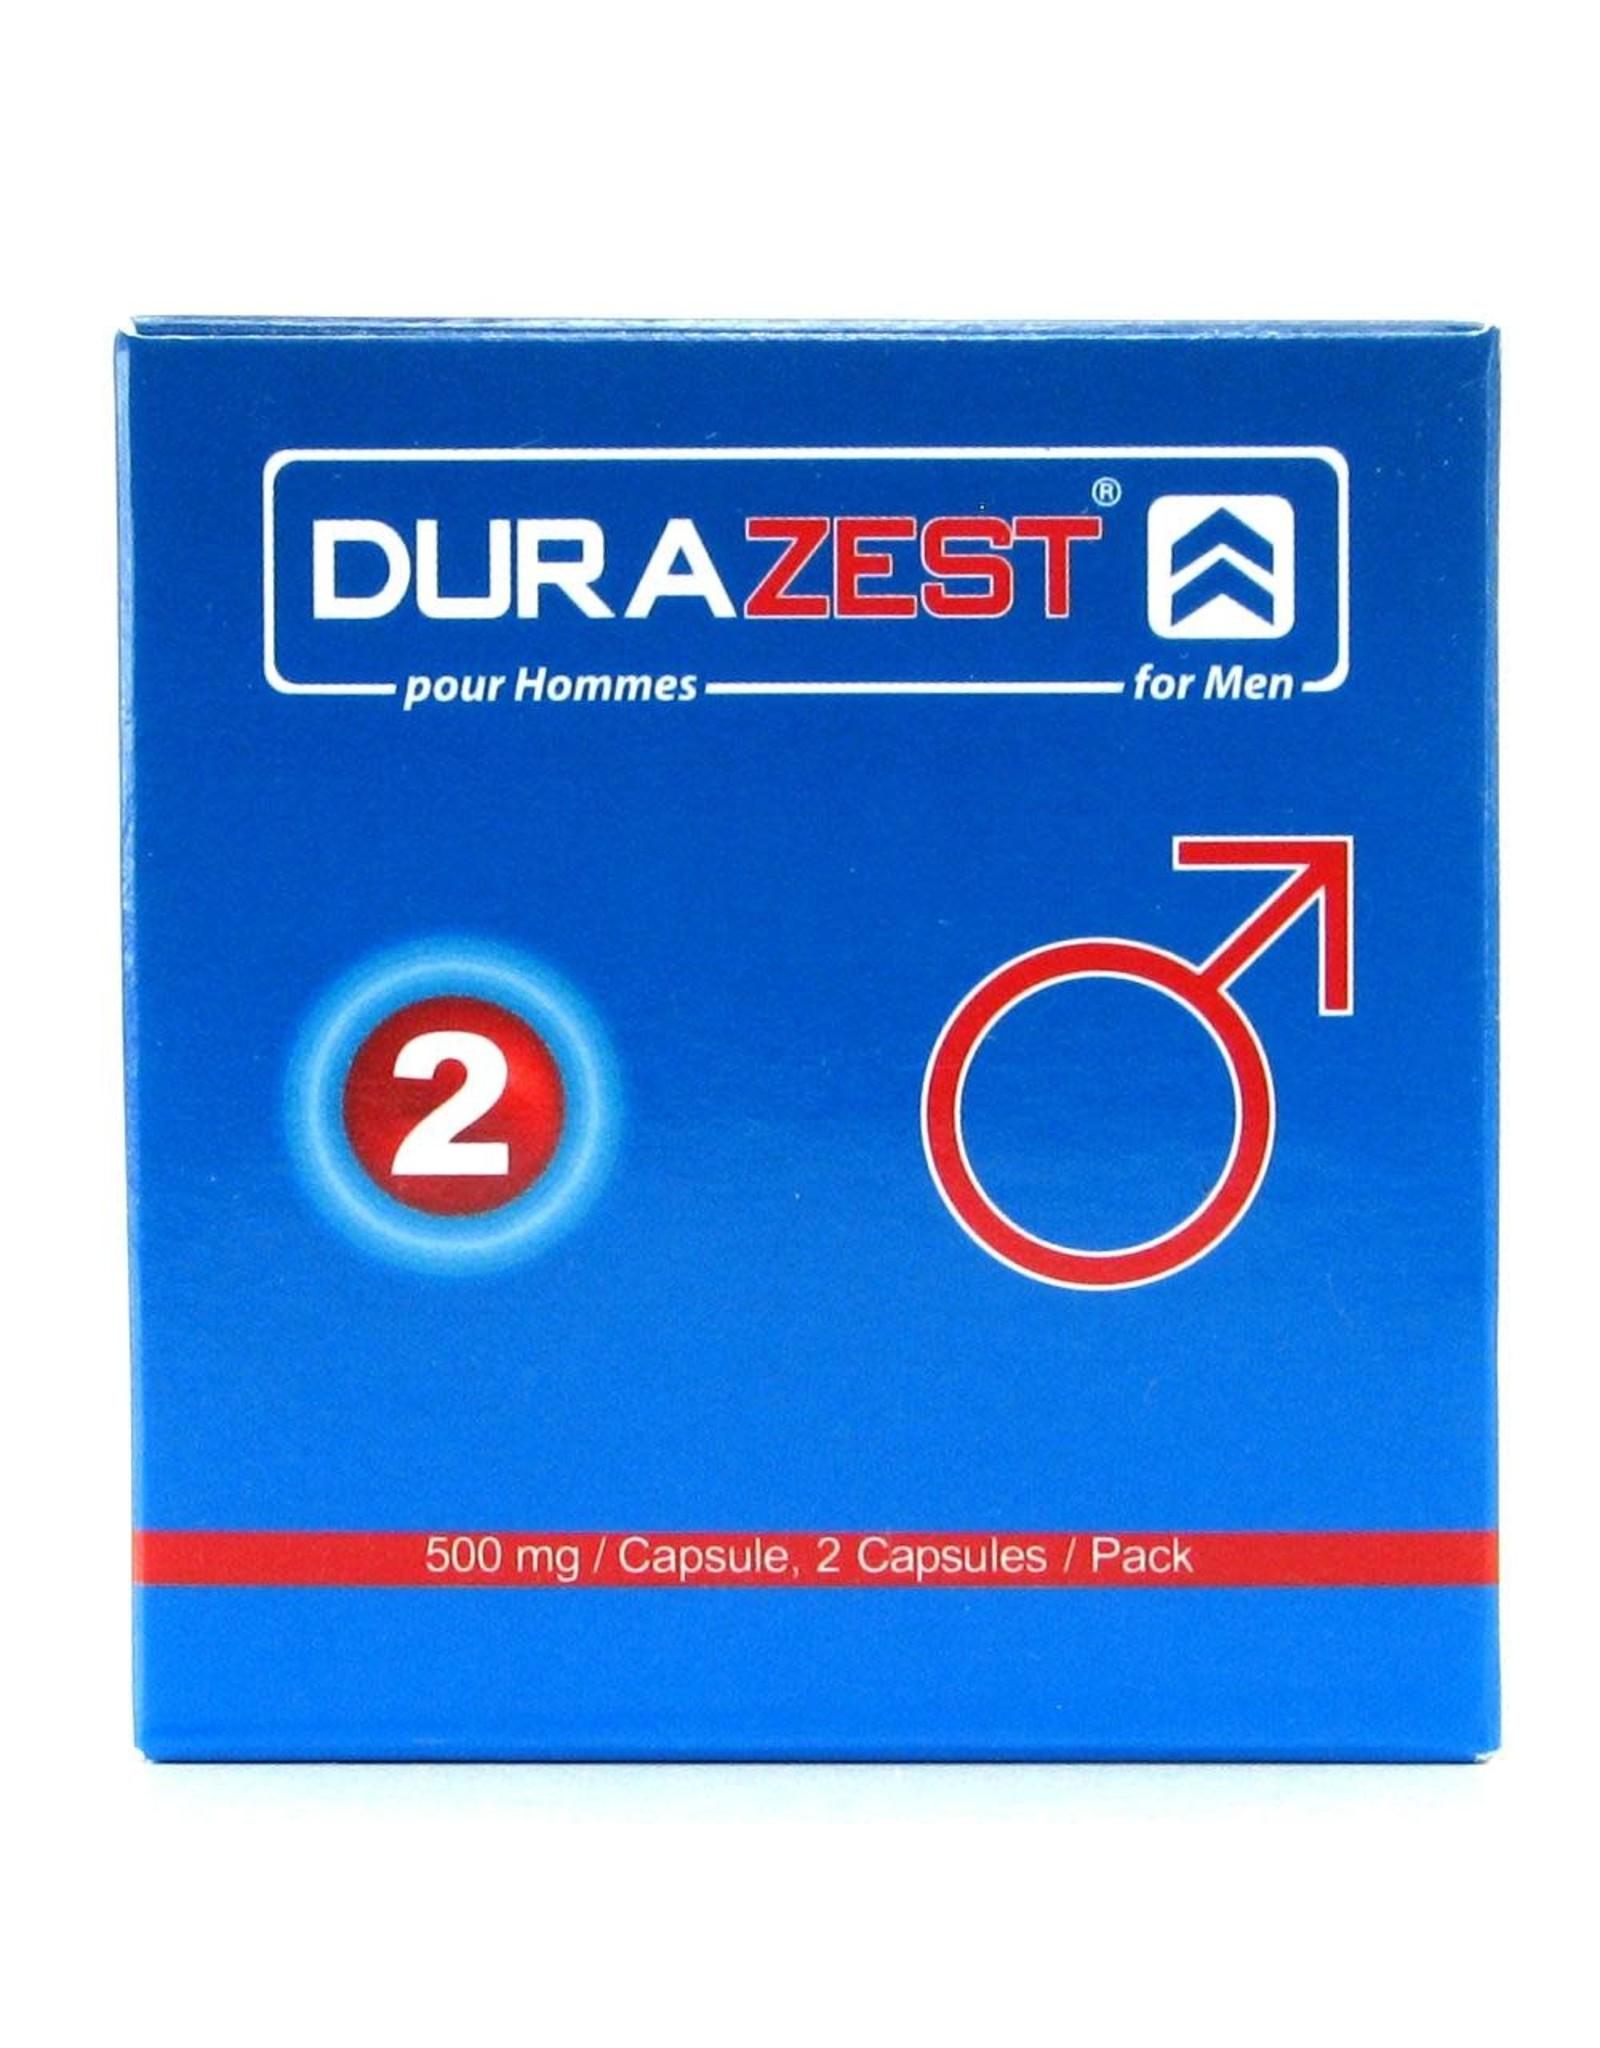 DURAZEST FOR MEN - 2 PACK